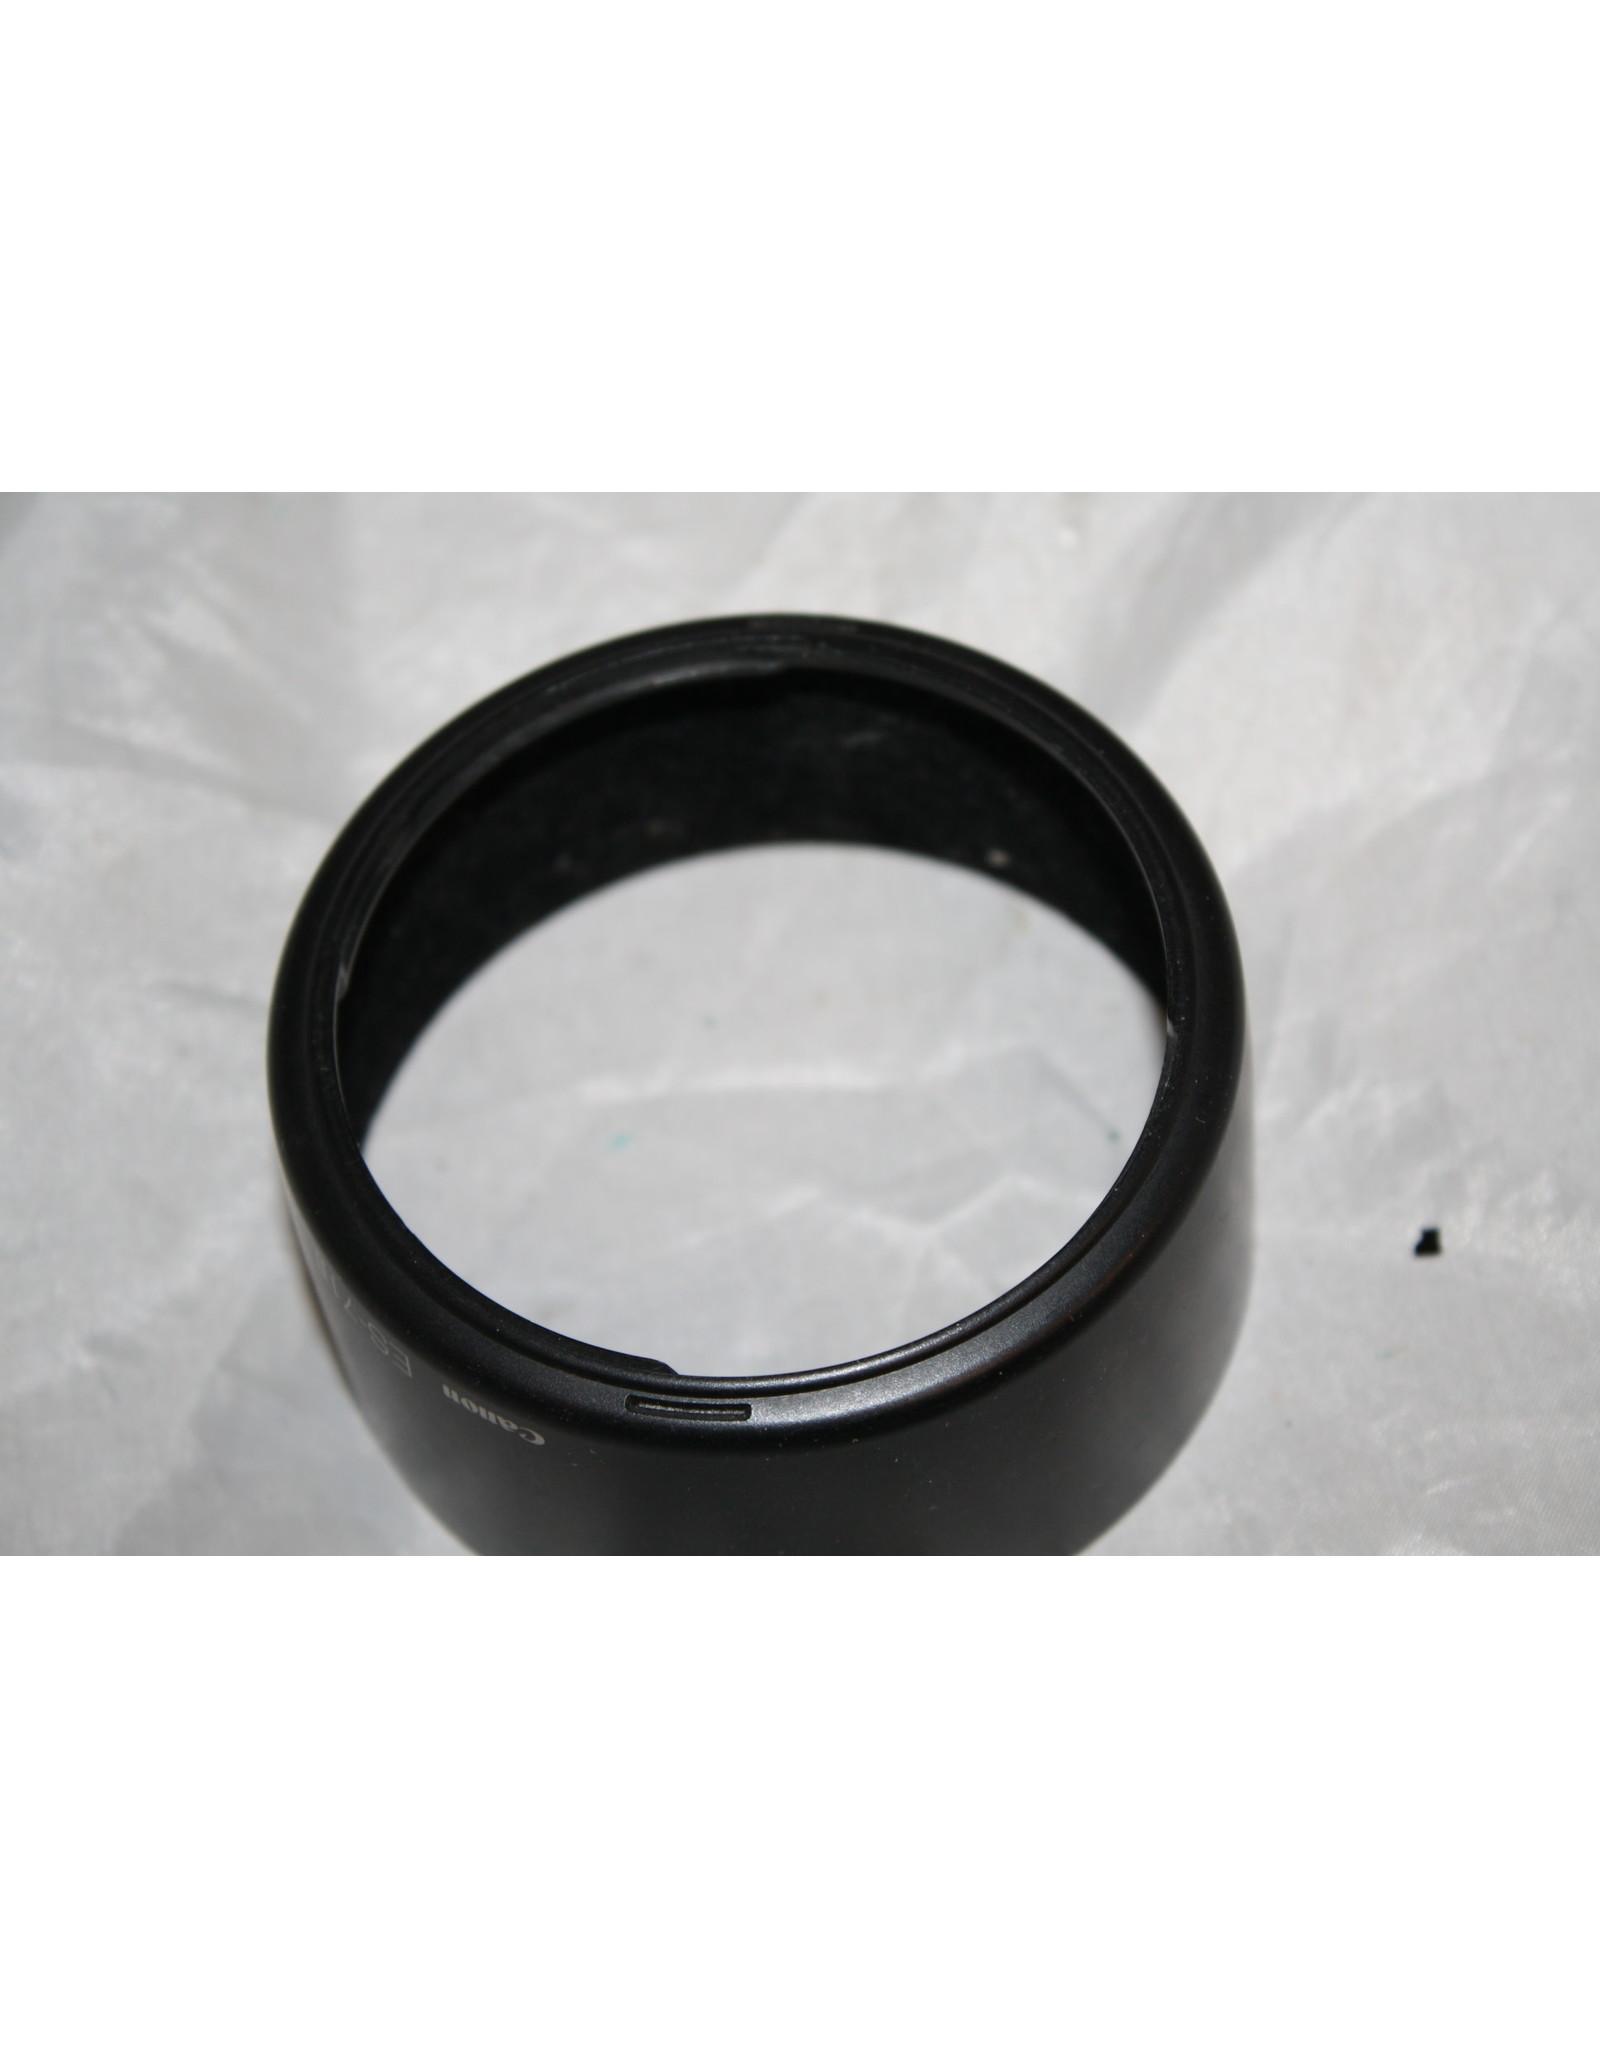 Canon Lens Hood ES-71 II for EF 50mm f/1.4 Lens (Pre-owned)